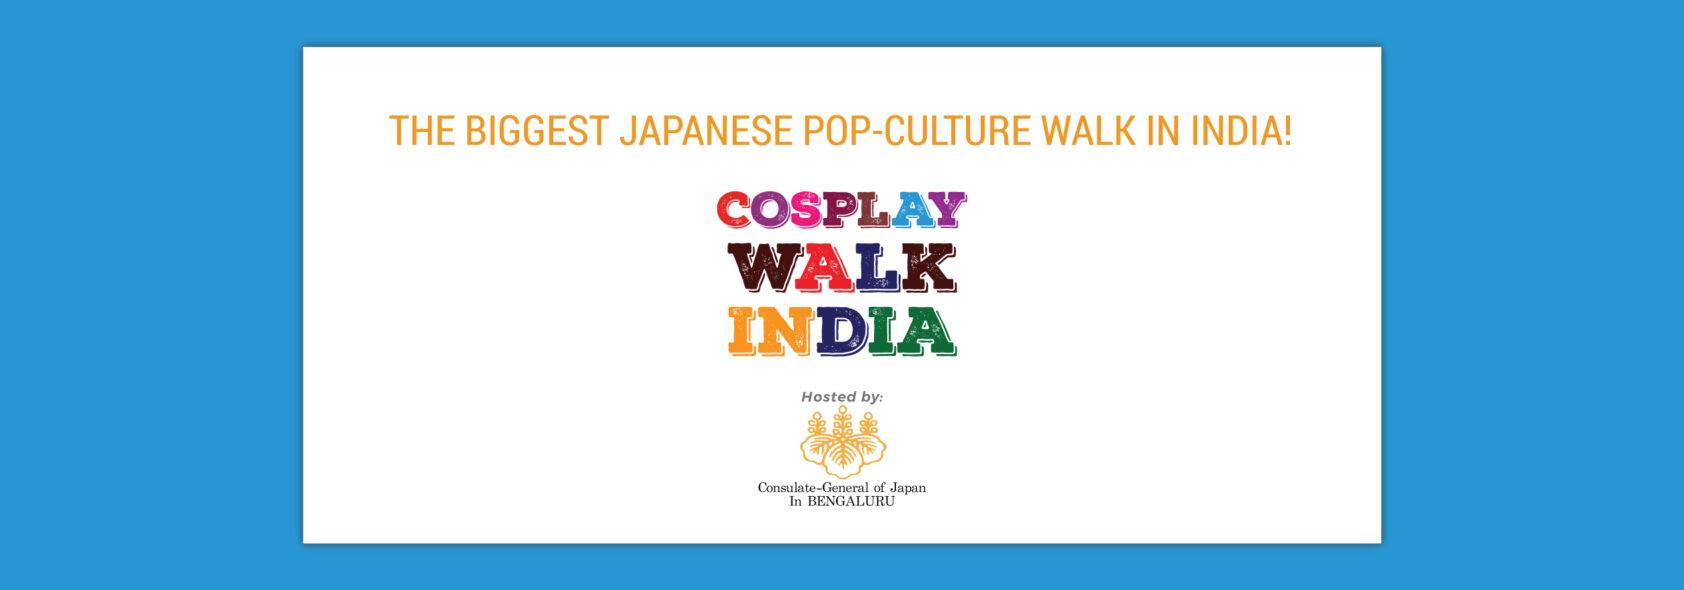 Image of Cosplay Walk India